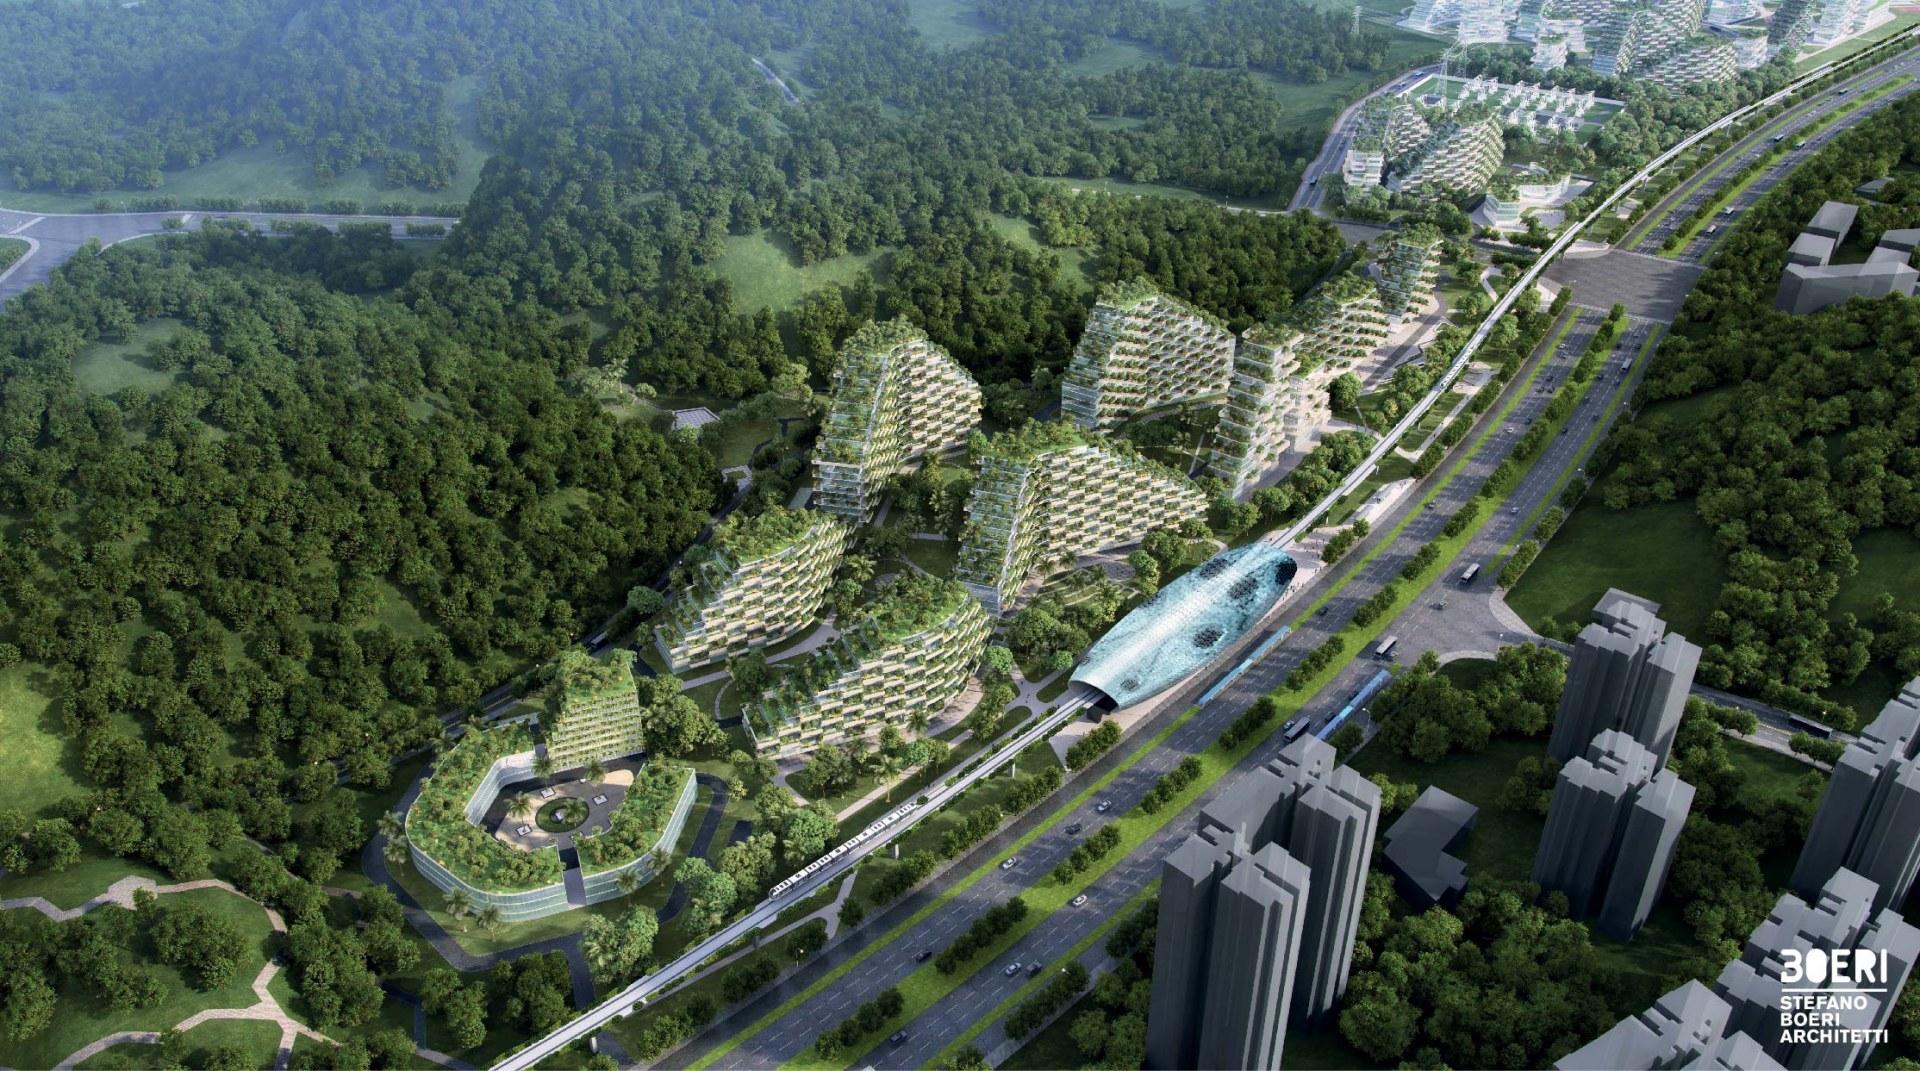 Stefano-Boeri-Architetti_Liuzhou-Forest-city_view-1